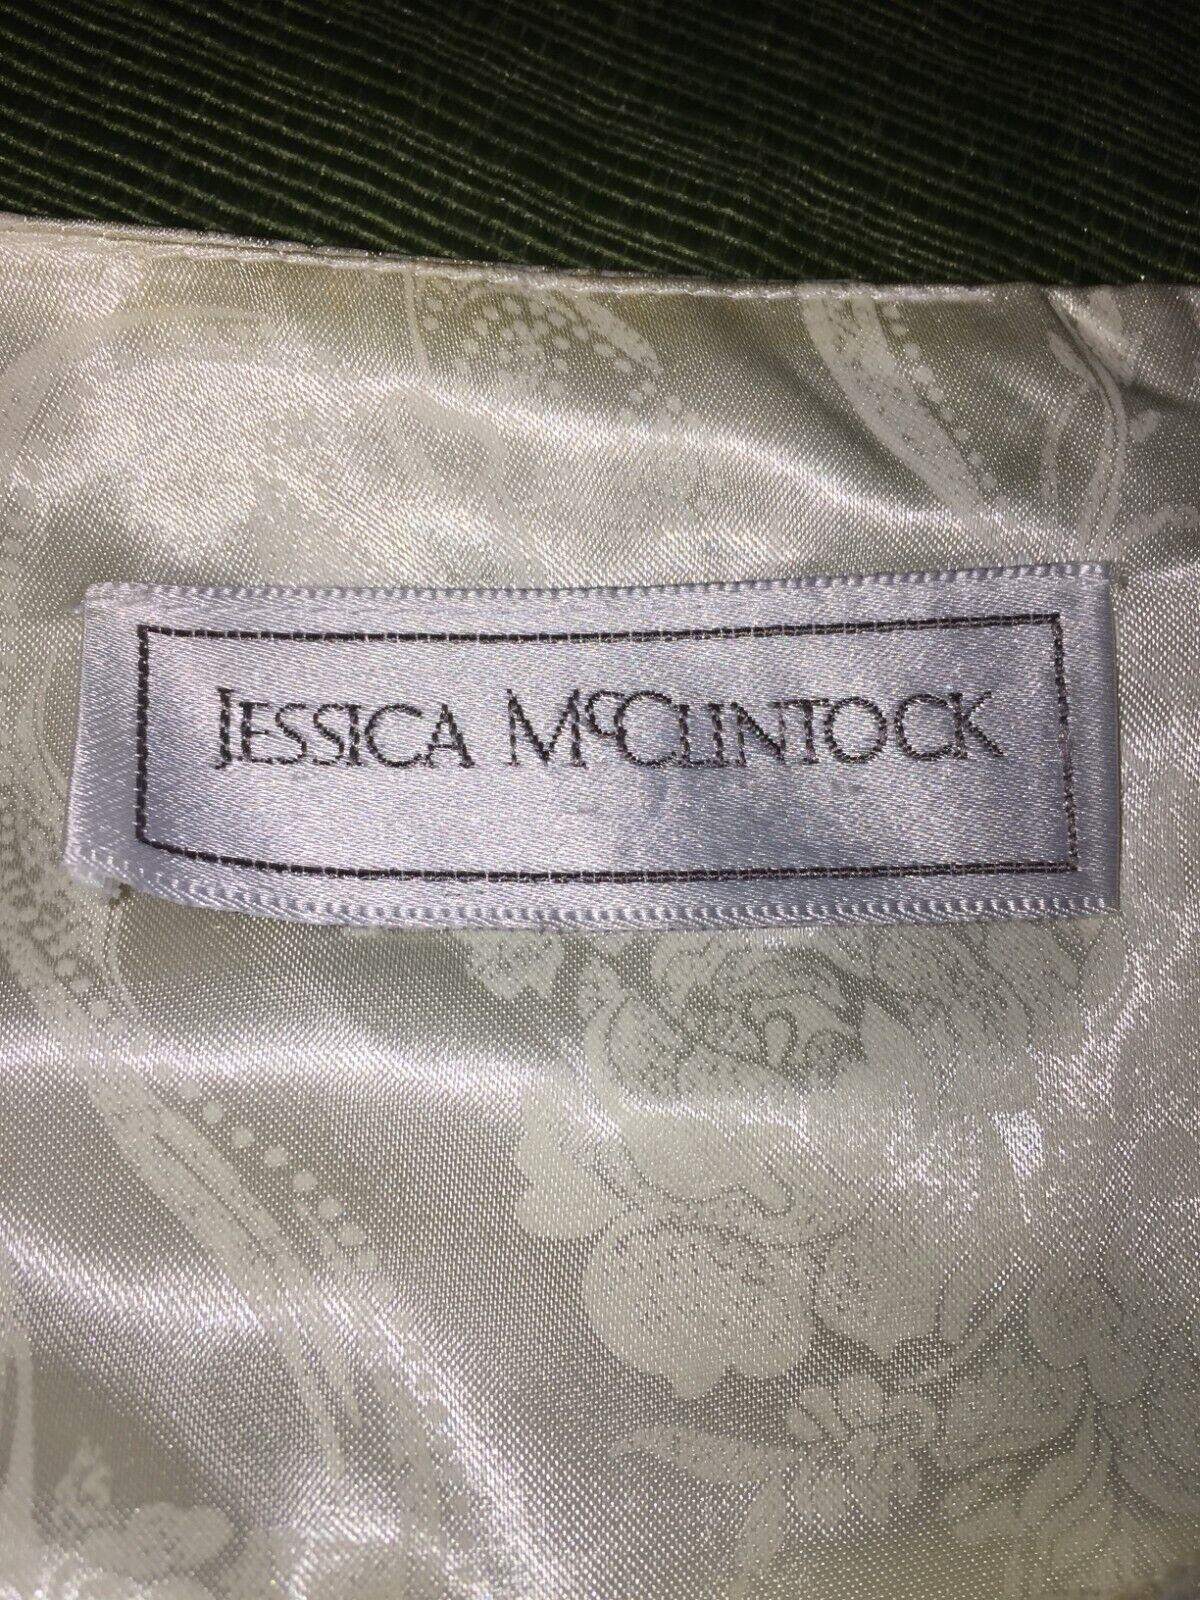 VINTAGE Jessica McClintock Crinoline Skirt 80s - image 7